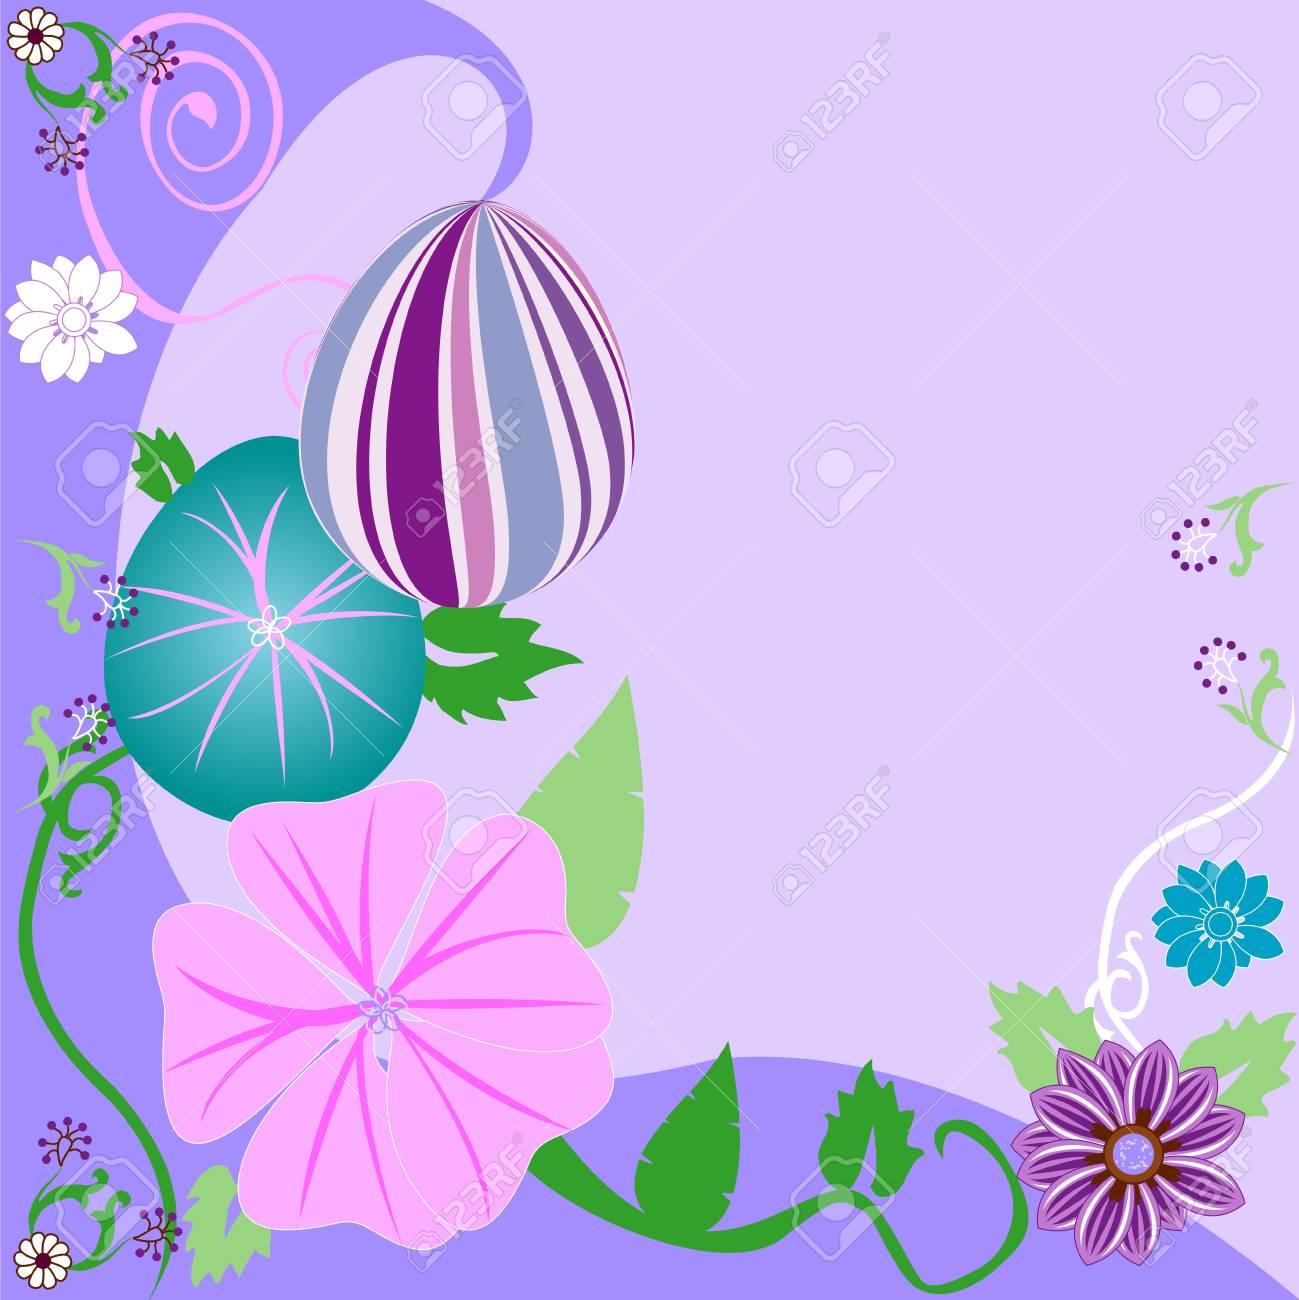 Vector Illustration of Easter Egg Floral Background. Stock Vector - 9274978